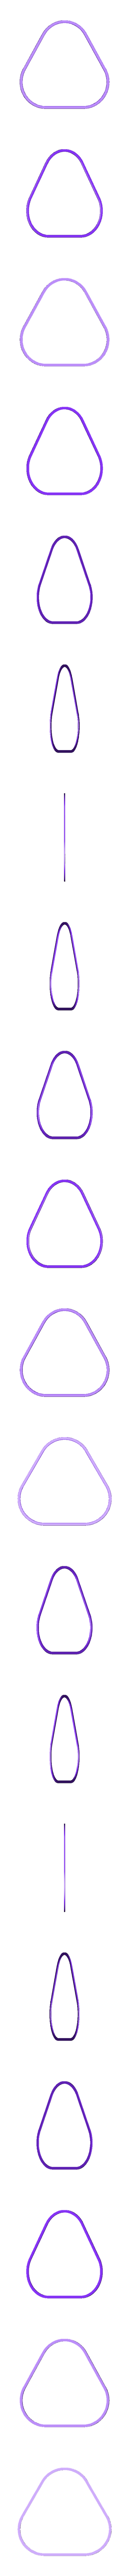 Poly_Build_Plate_v1-1.STL Download free STL file Polycarbonate Tiko Build Plate • Model to 3D print, WalterHsiao